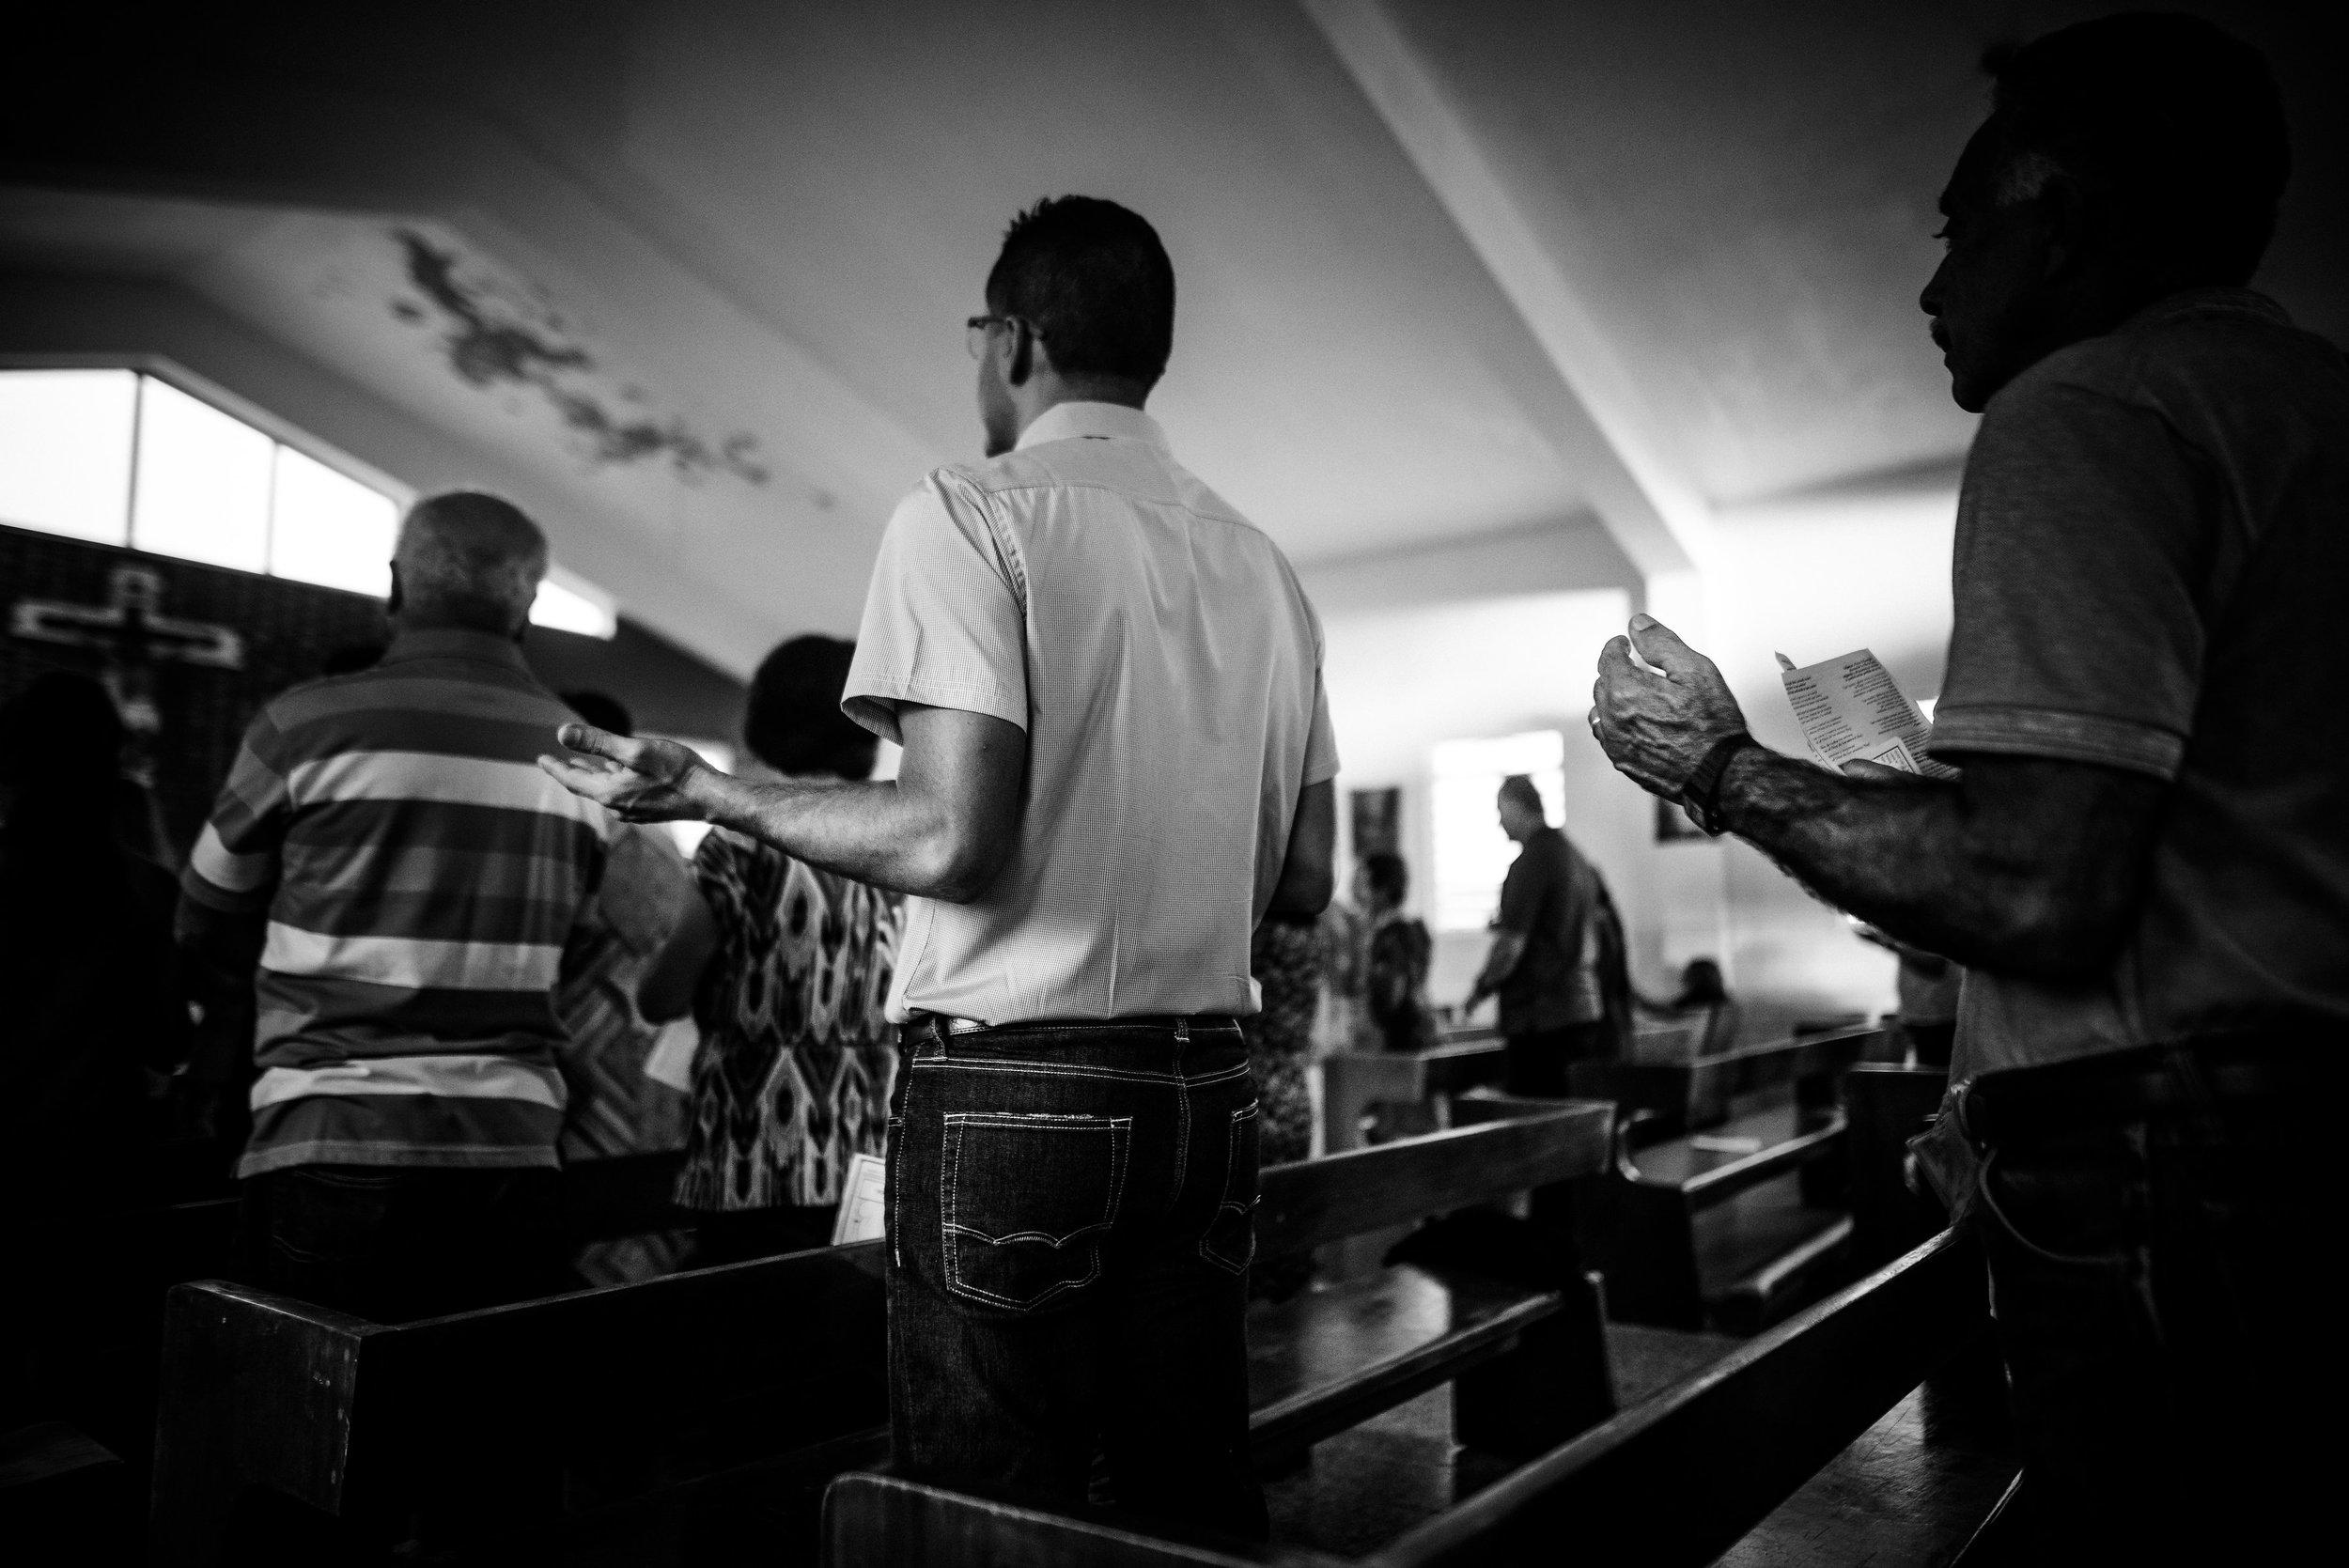 The Hernandez Family at Mass. Photo: Aniya Emtage Legnaro